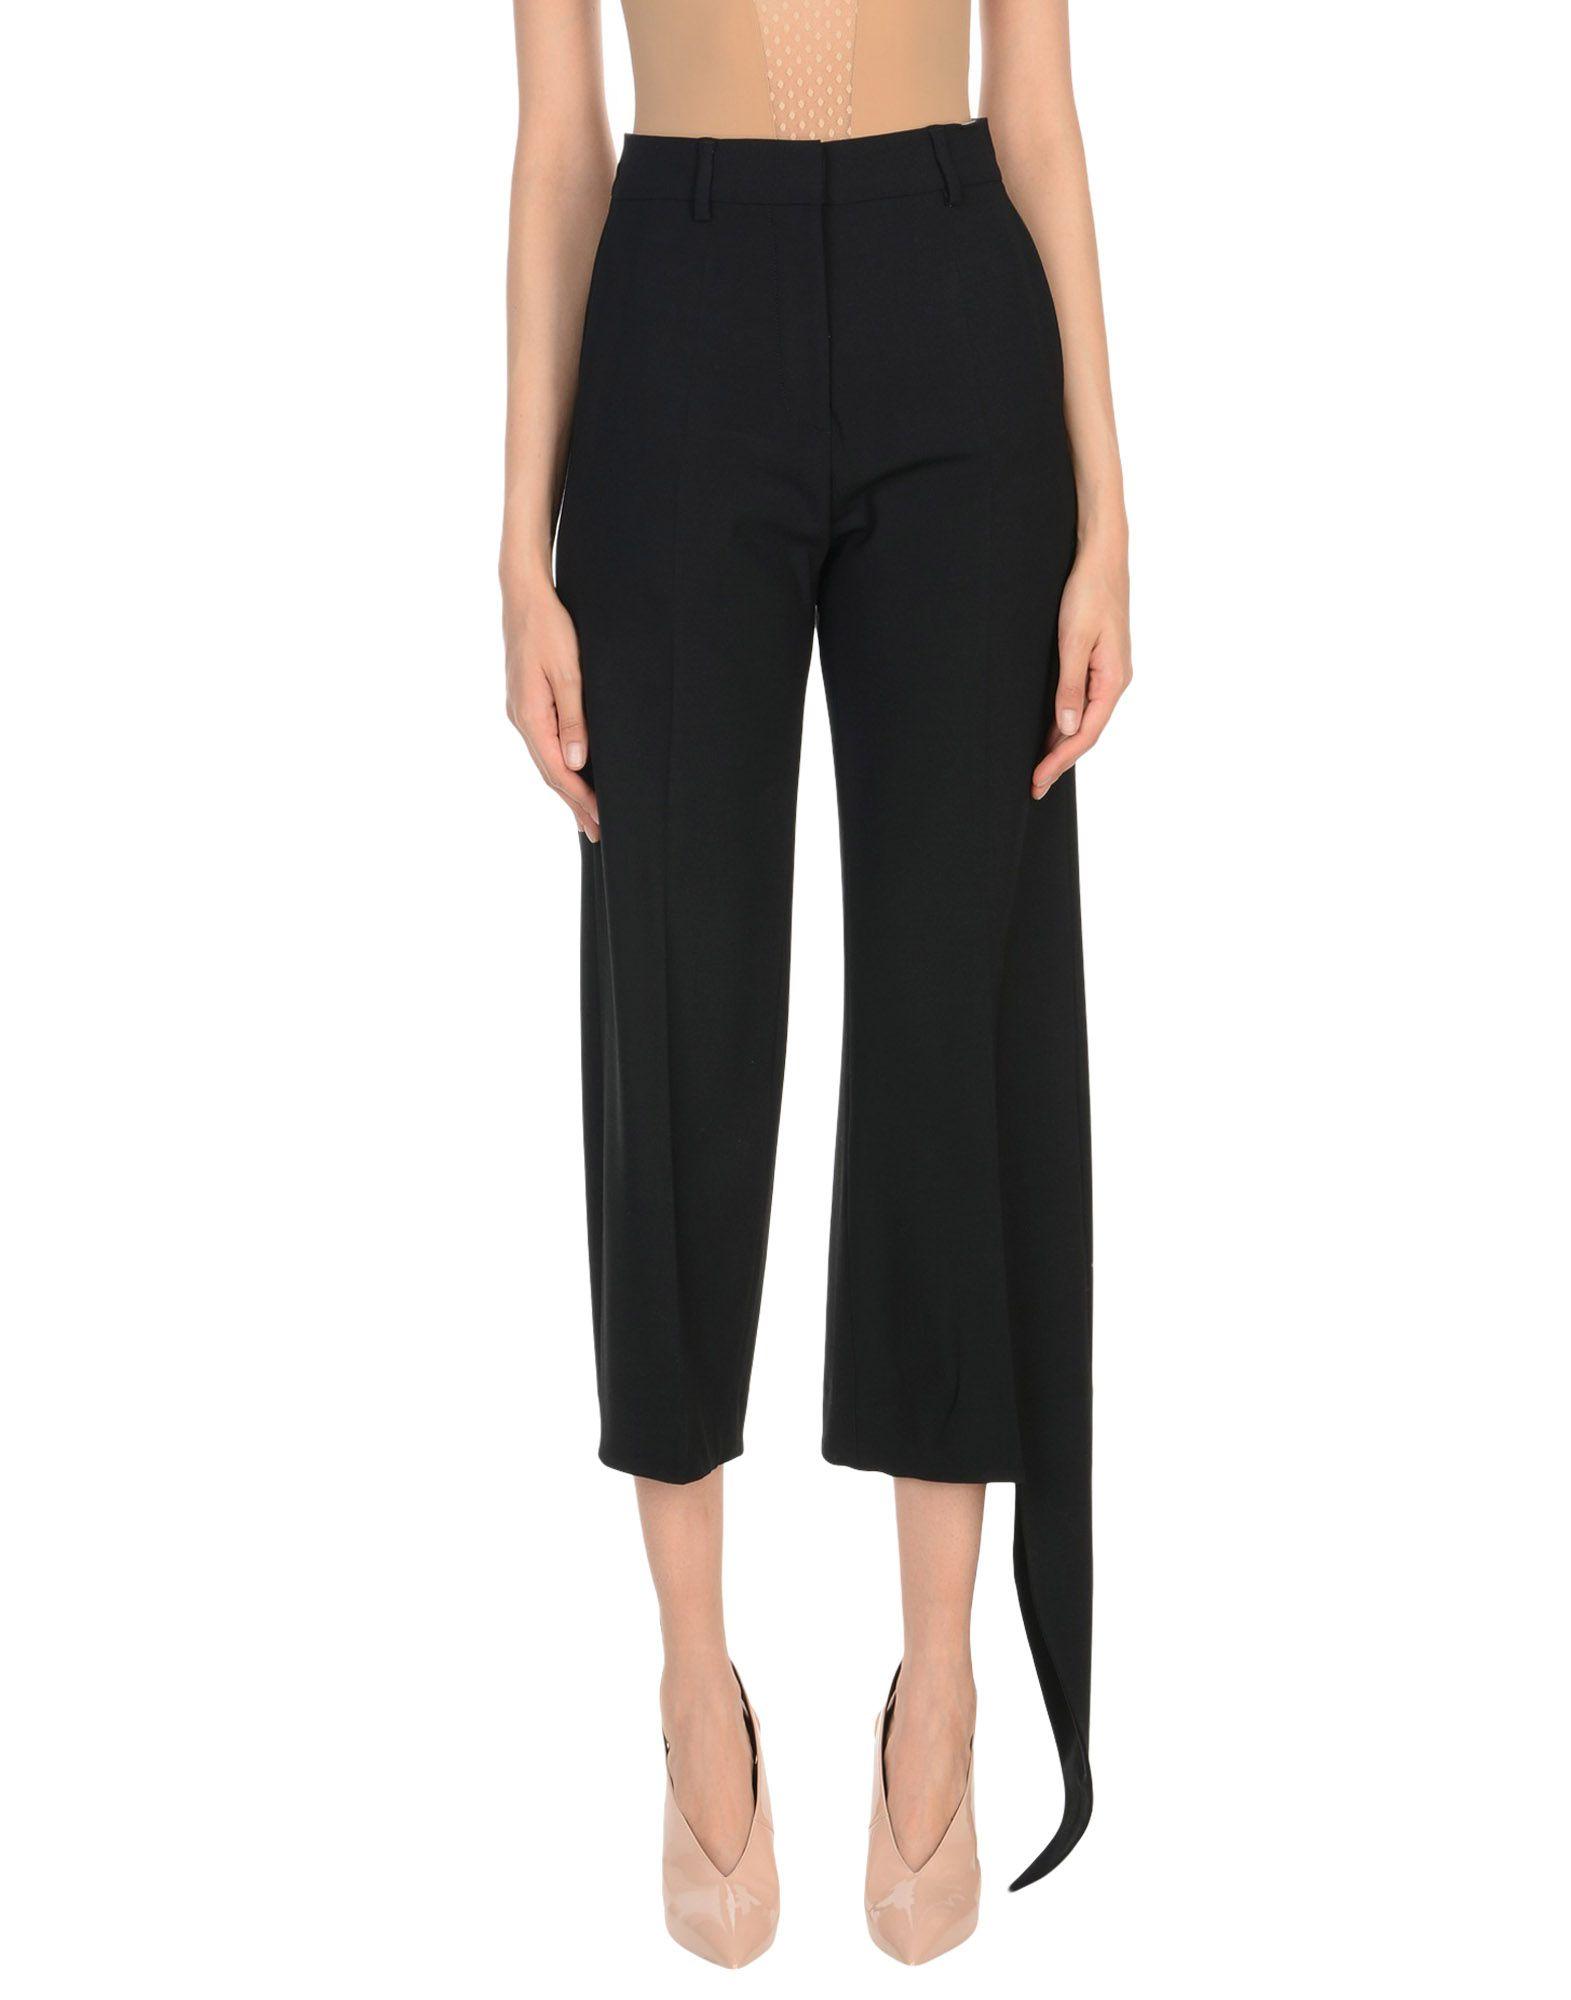 Pantalone J.W.Anderson Donna - Acquista online su bGSLTH